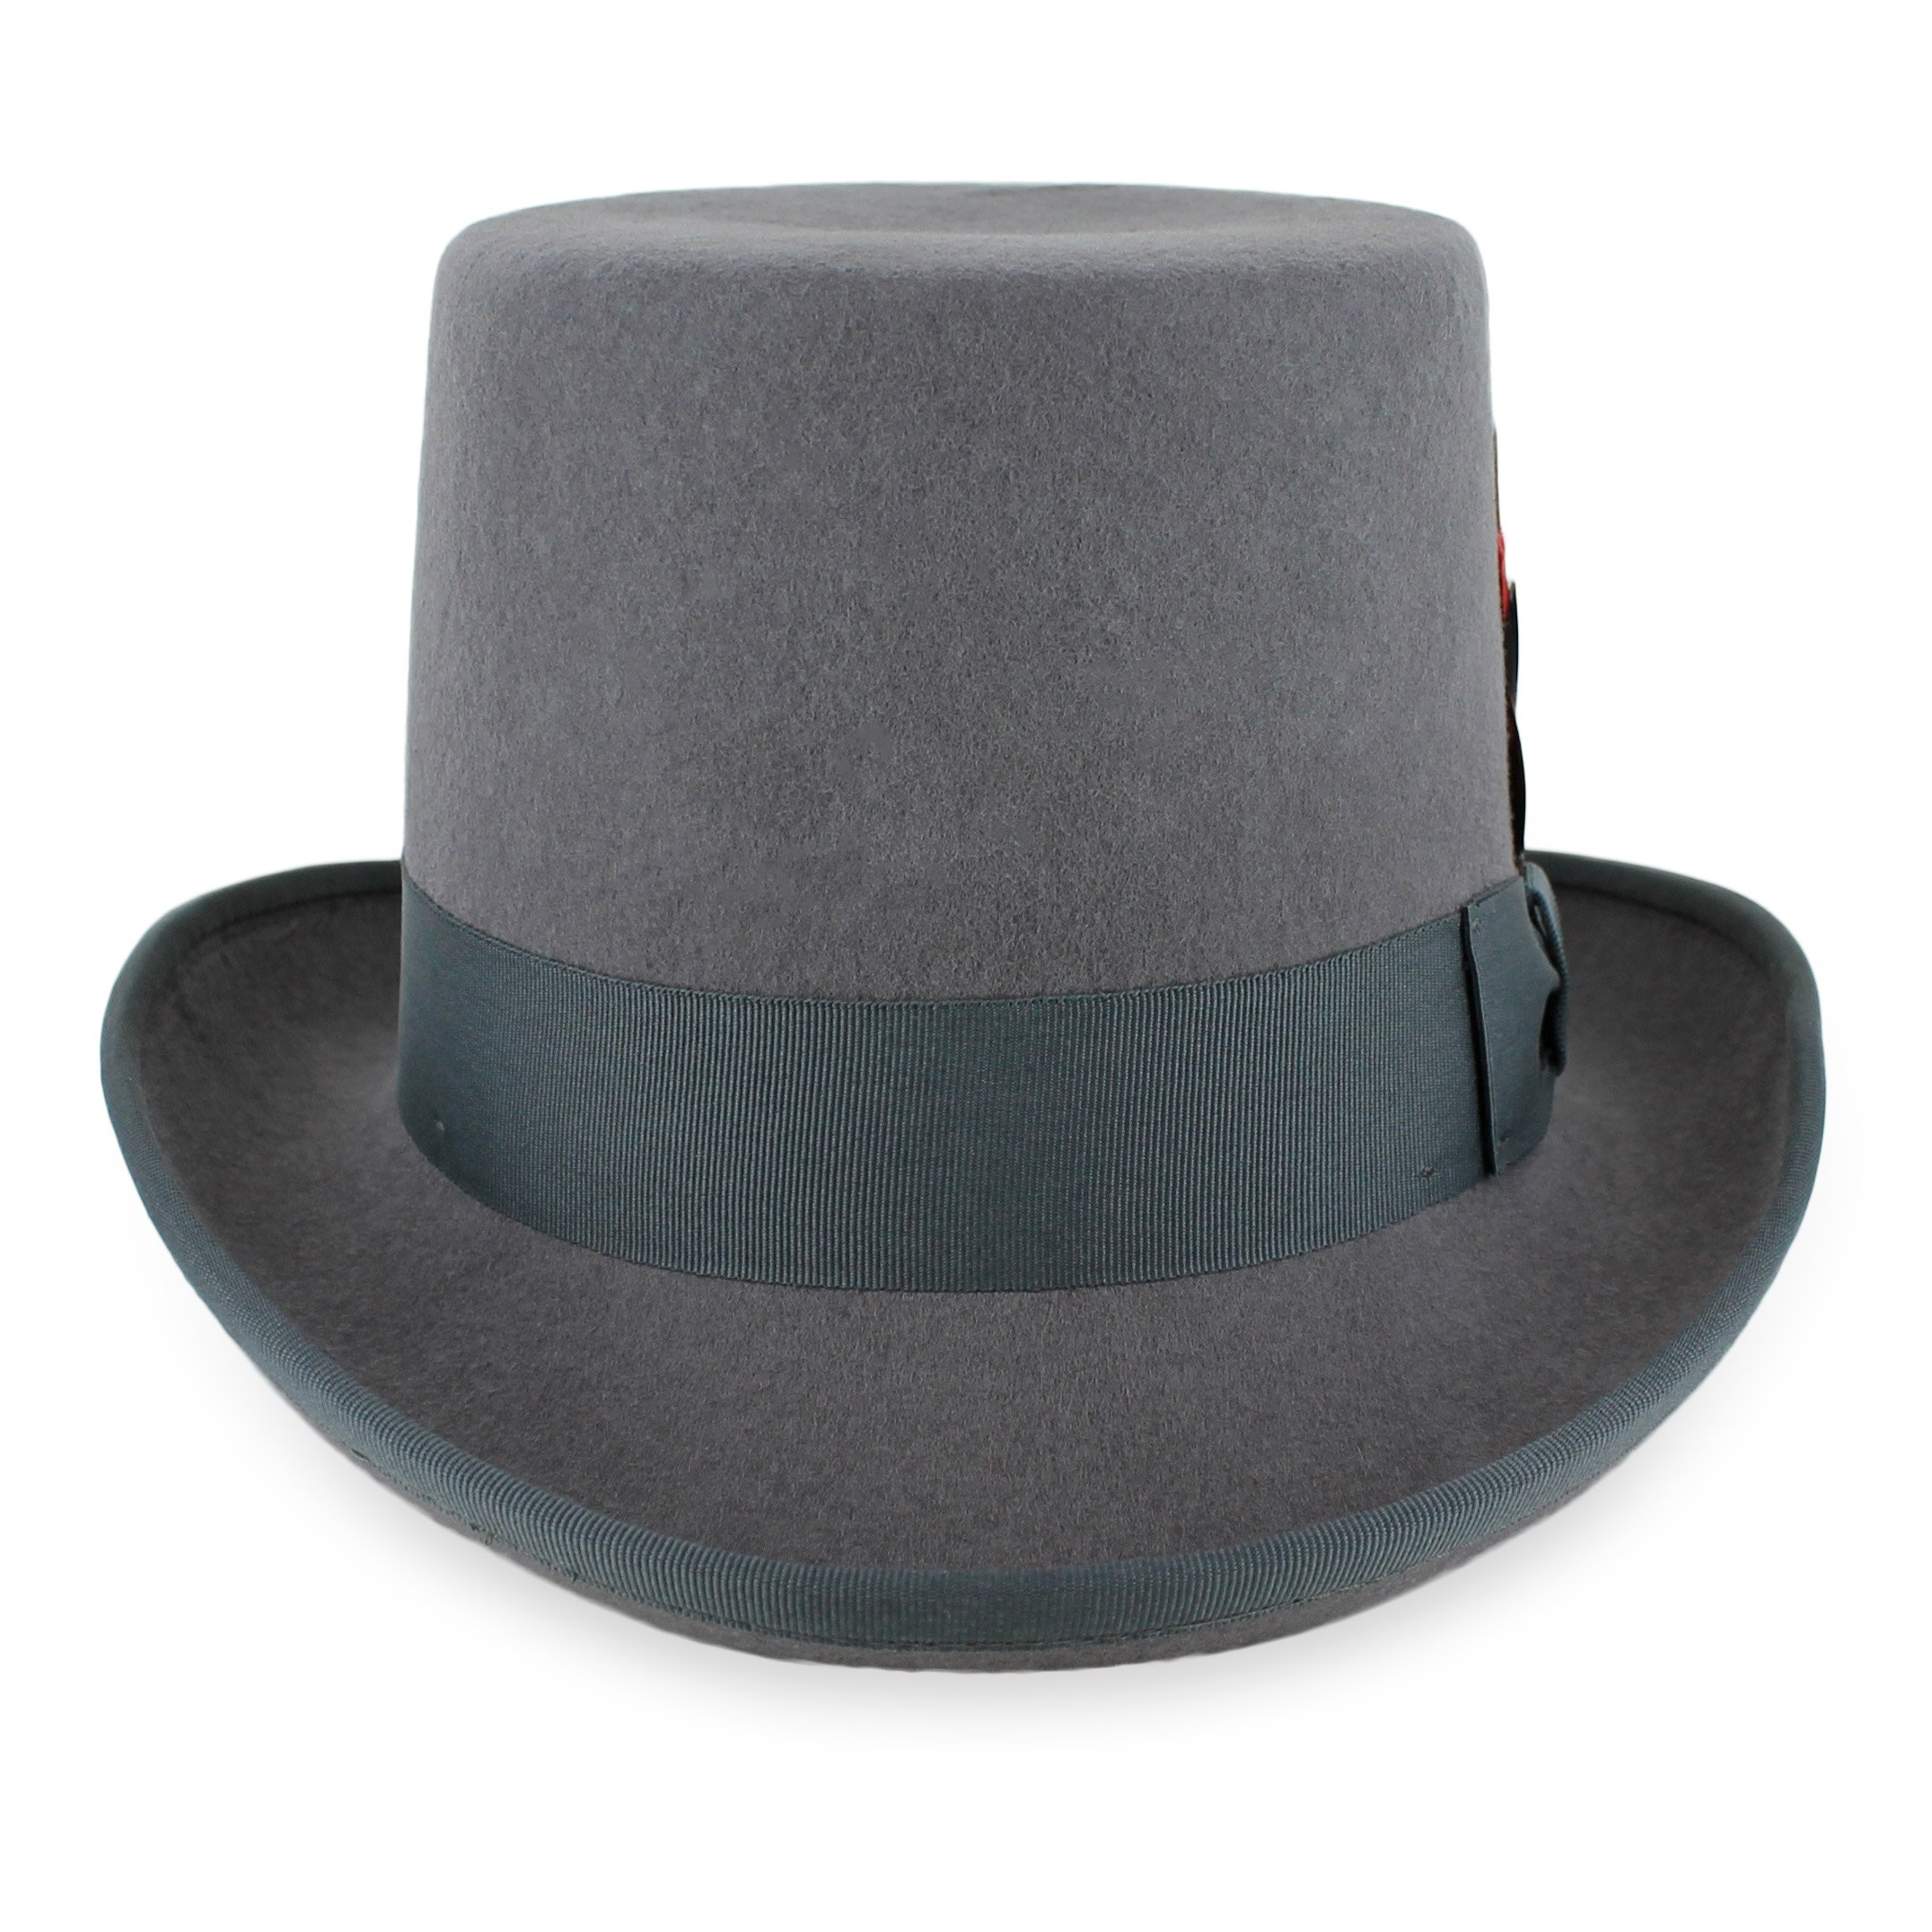 c6ccbeca609 Belfry Topper 100% Wool Satin Lined Men s Top Hat in Black Grey Navy Pearl  product